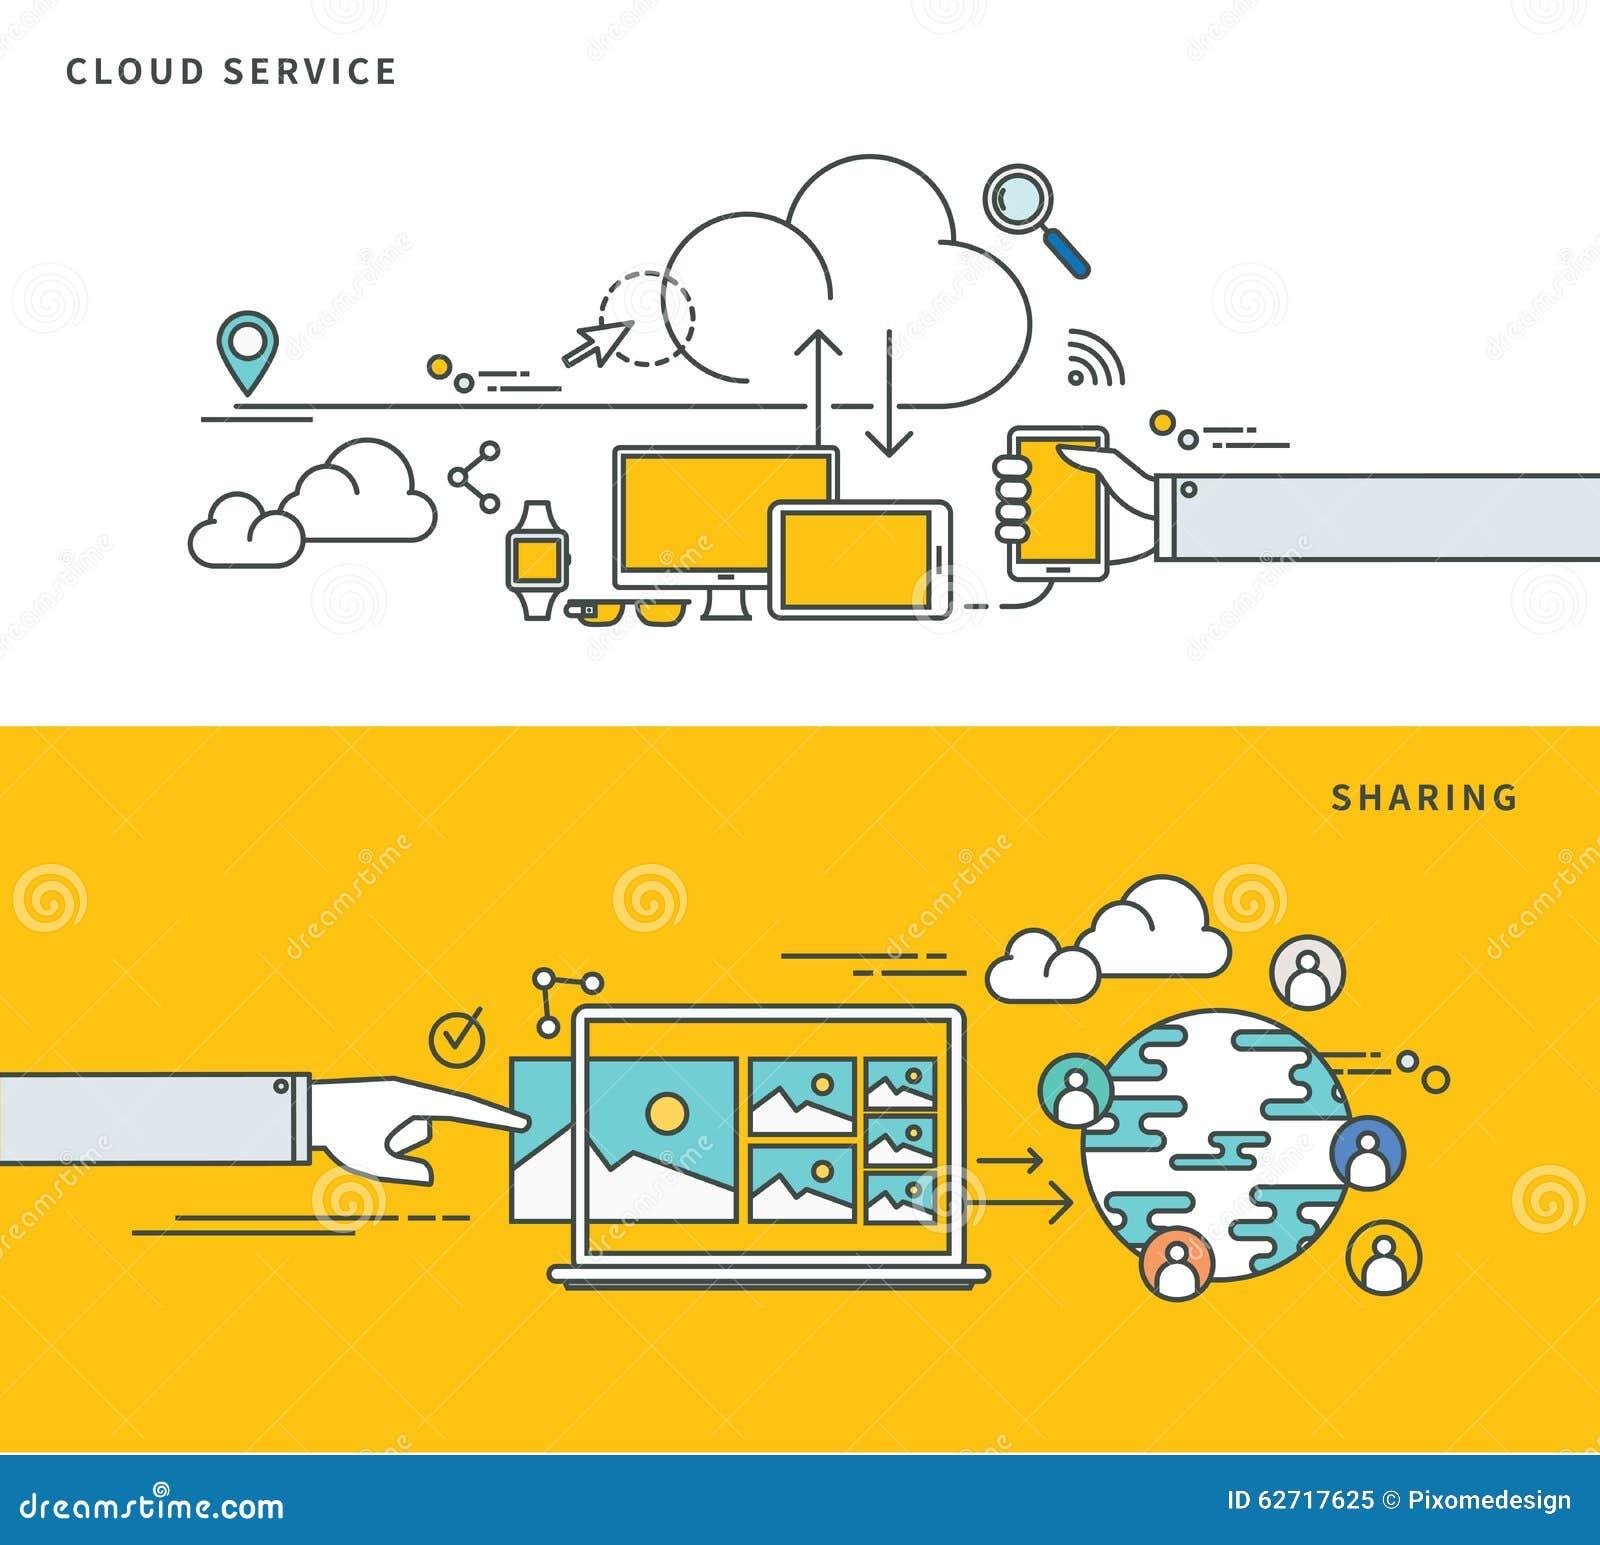 Simple line flat design of cloud service & sharing, modern vector illustration.